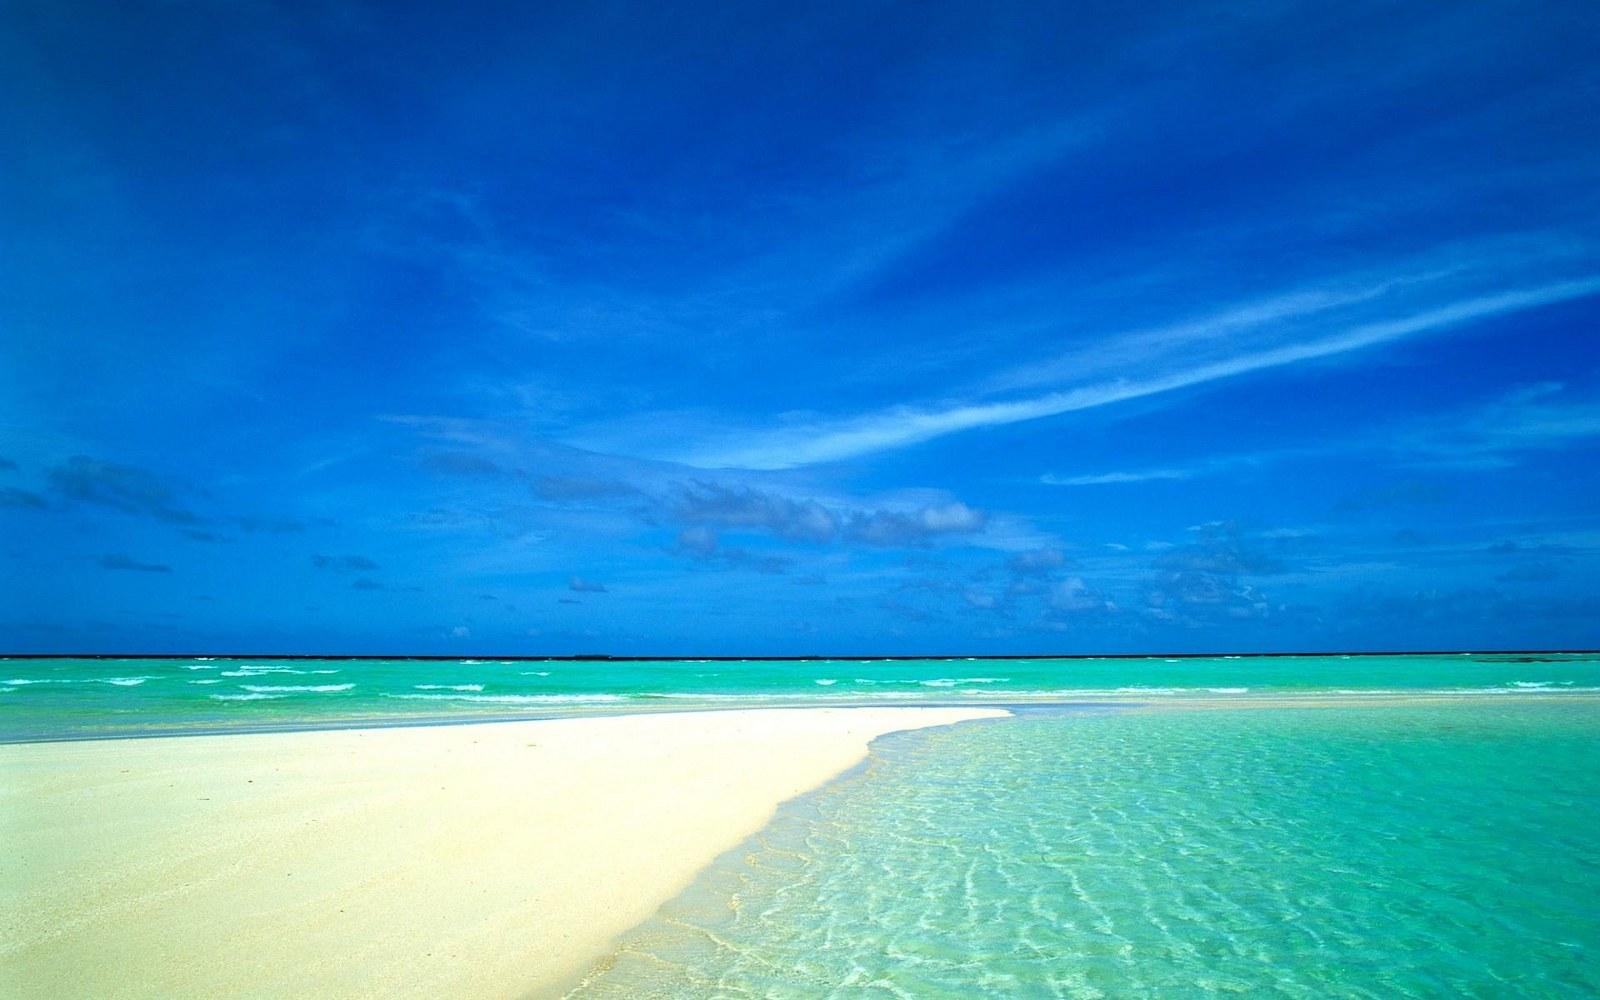 Beach Ocean The Latest Wallpaper wallpapers55com   Best Wallpapers 1600x1000